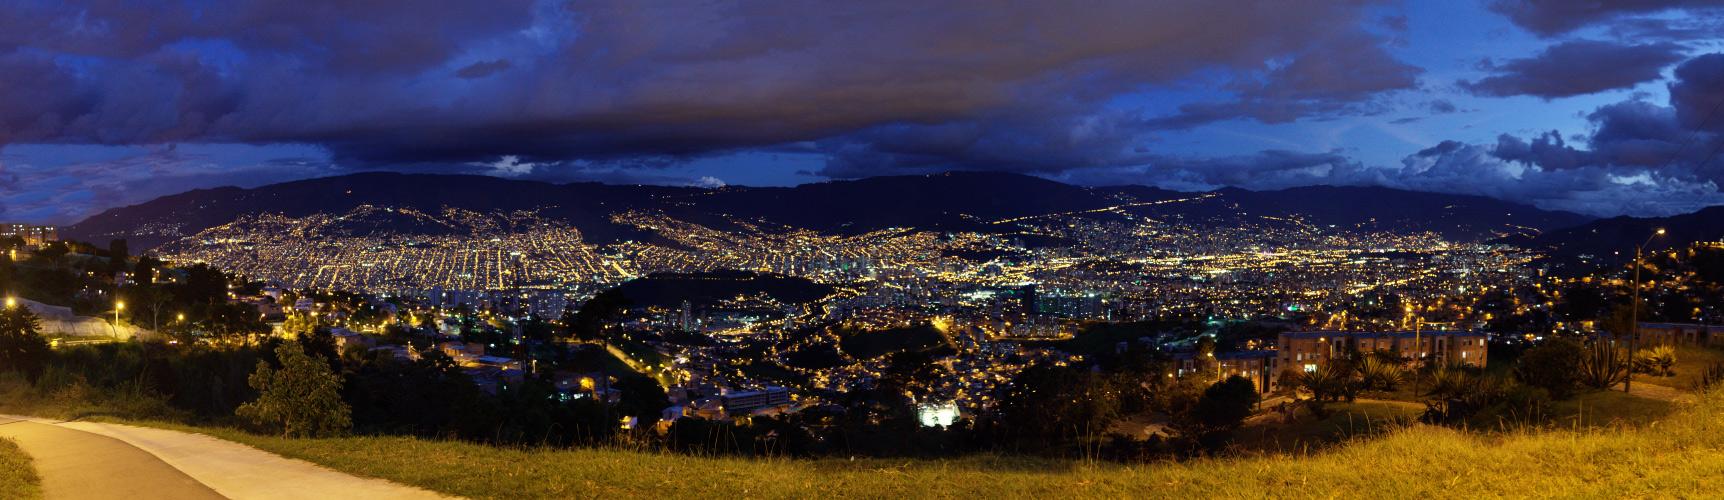 Valle de Medellin - hora azul